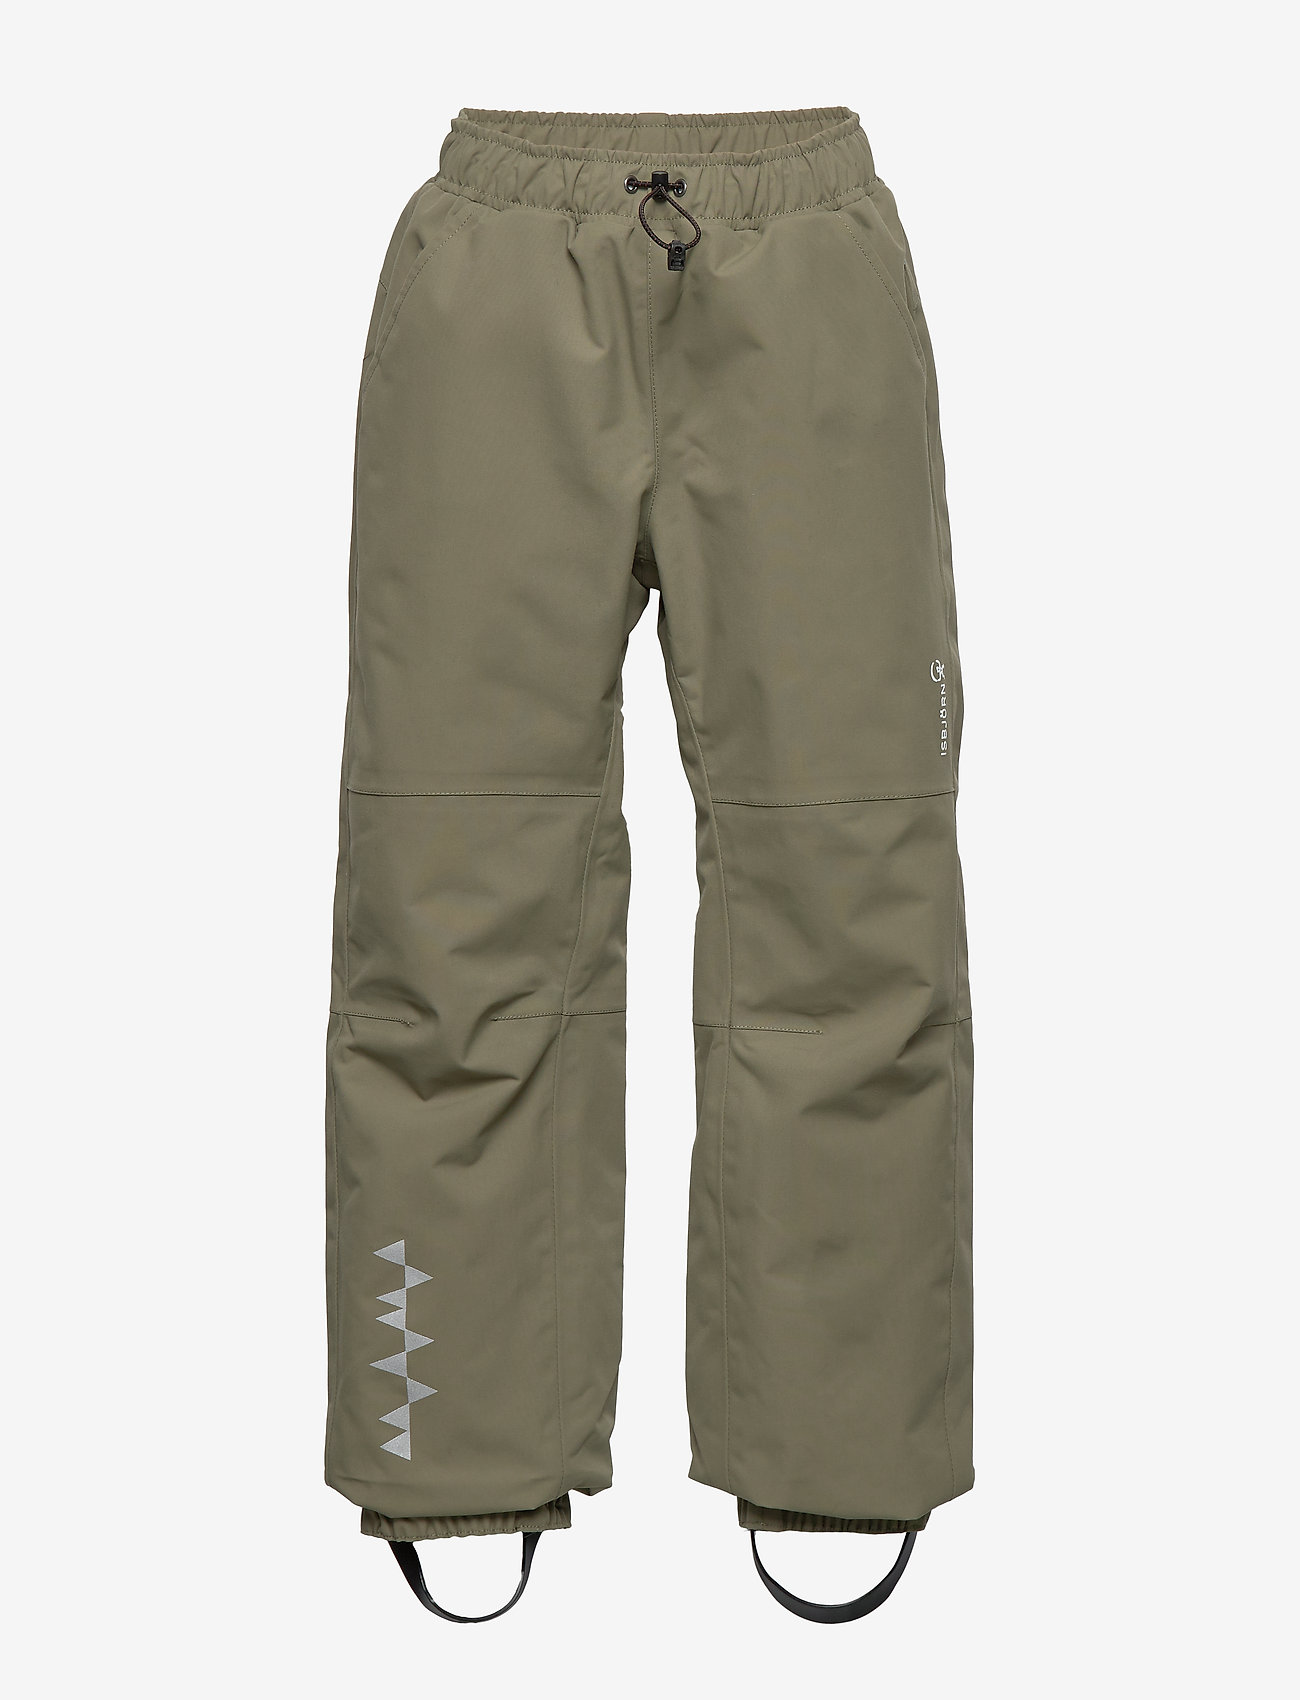 ISBJÖRN of Sweden - RAIN Pant 2L - shell & rain pants - moss - 0